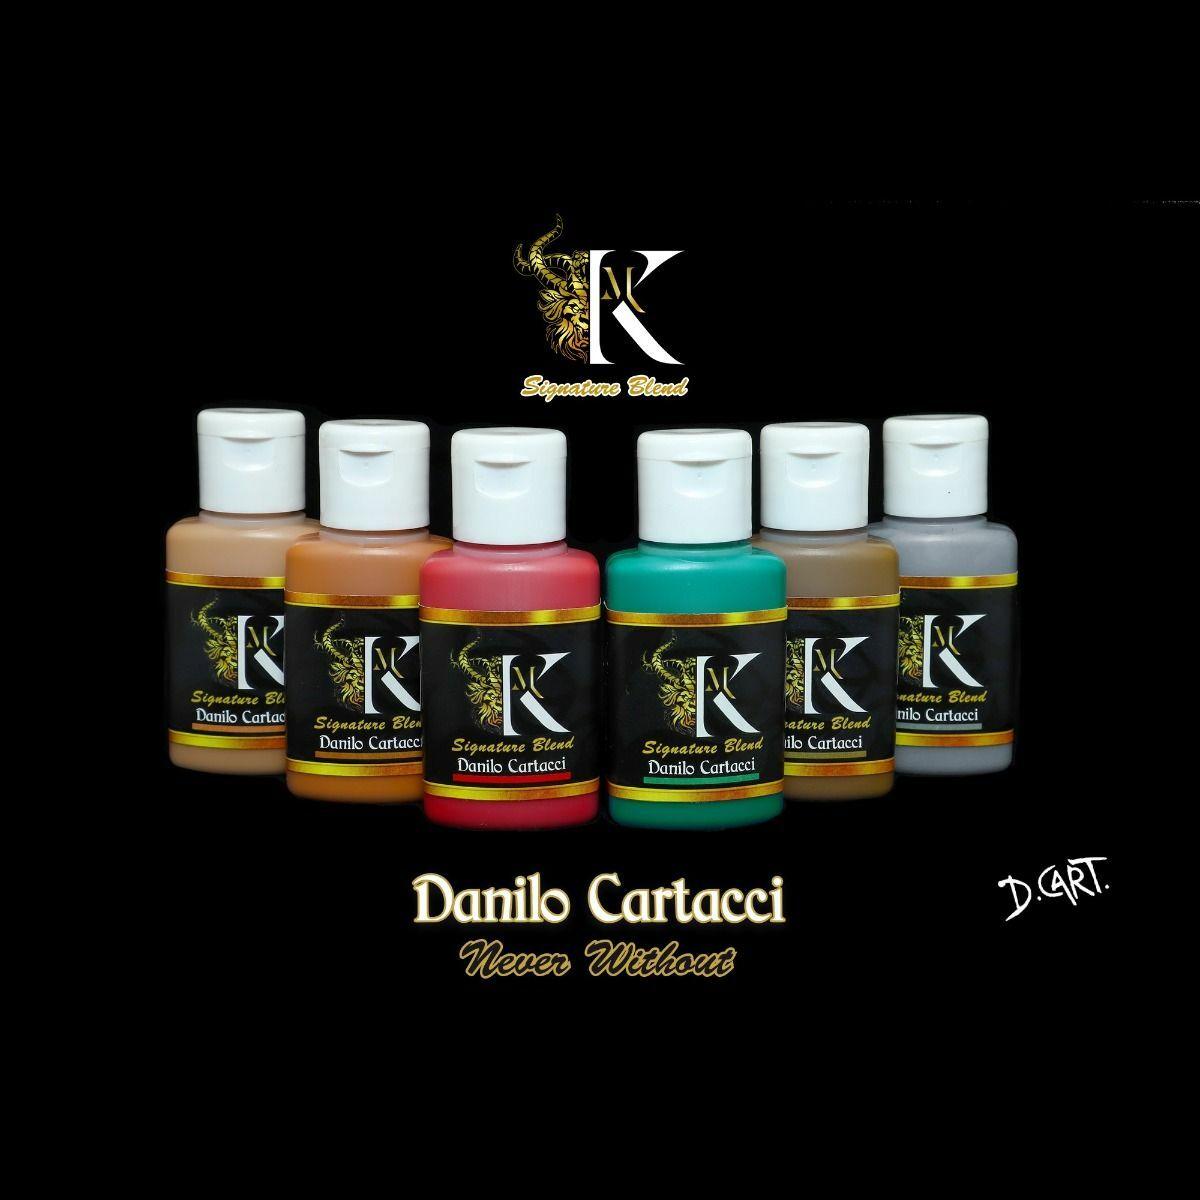 Kimera Kolors Signature Set: Danilo Cartacci - Never Without